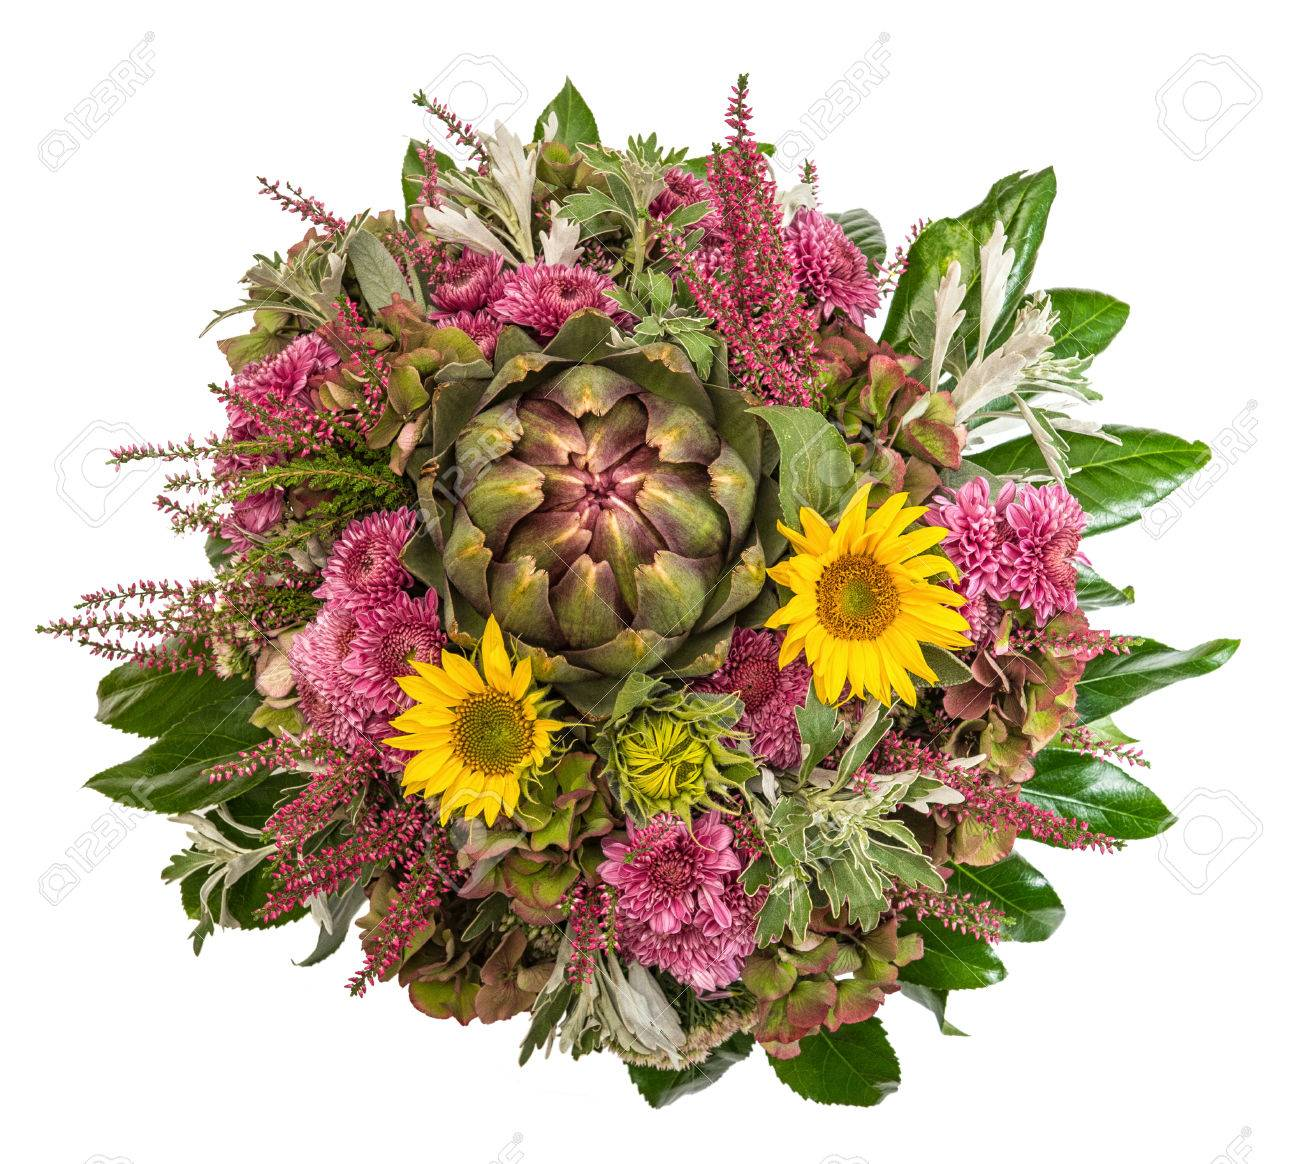 Flores De Otoño Ramo Arreglo Floral Con Girasoles Crisantemos Alcachofa